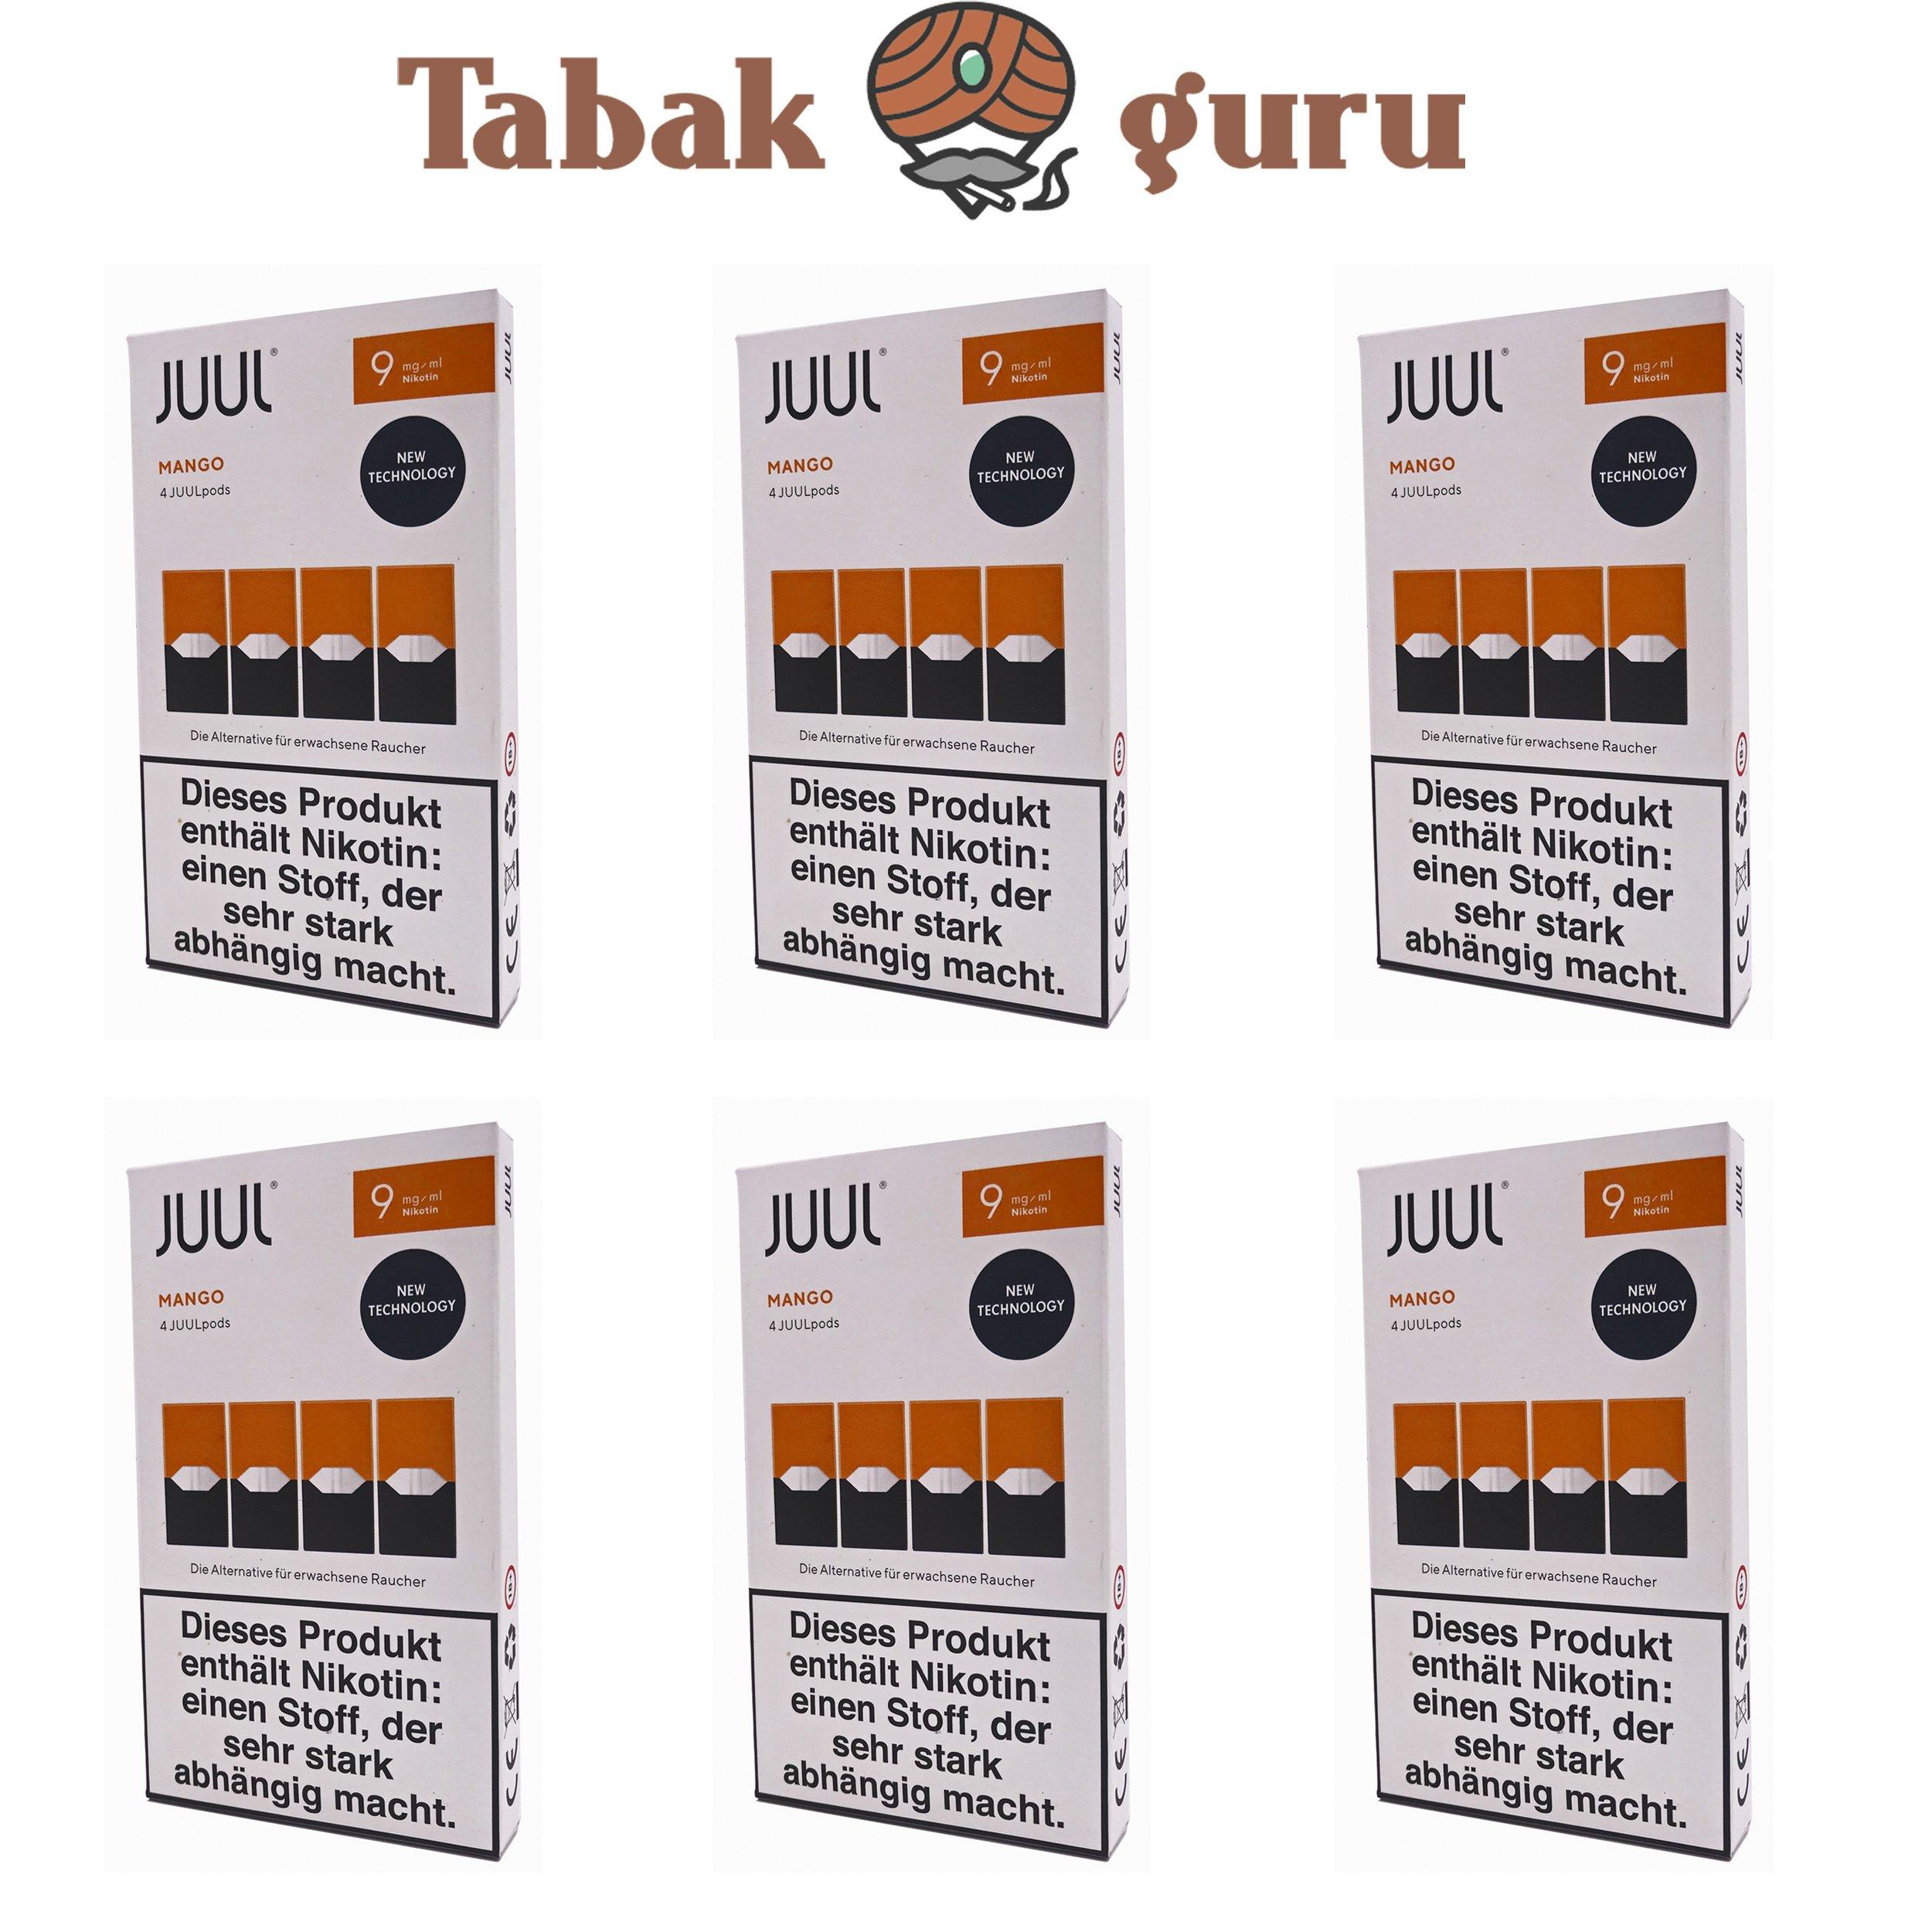 JUUL 6 Packungen Mango Pods 9mg/ml á 4 Pods